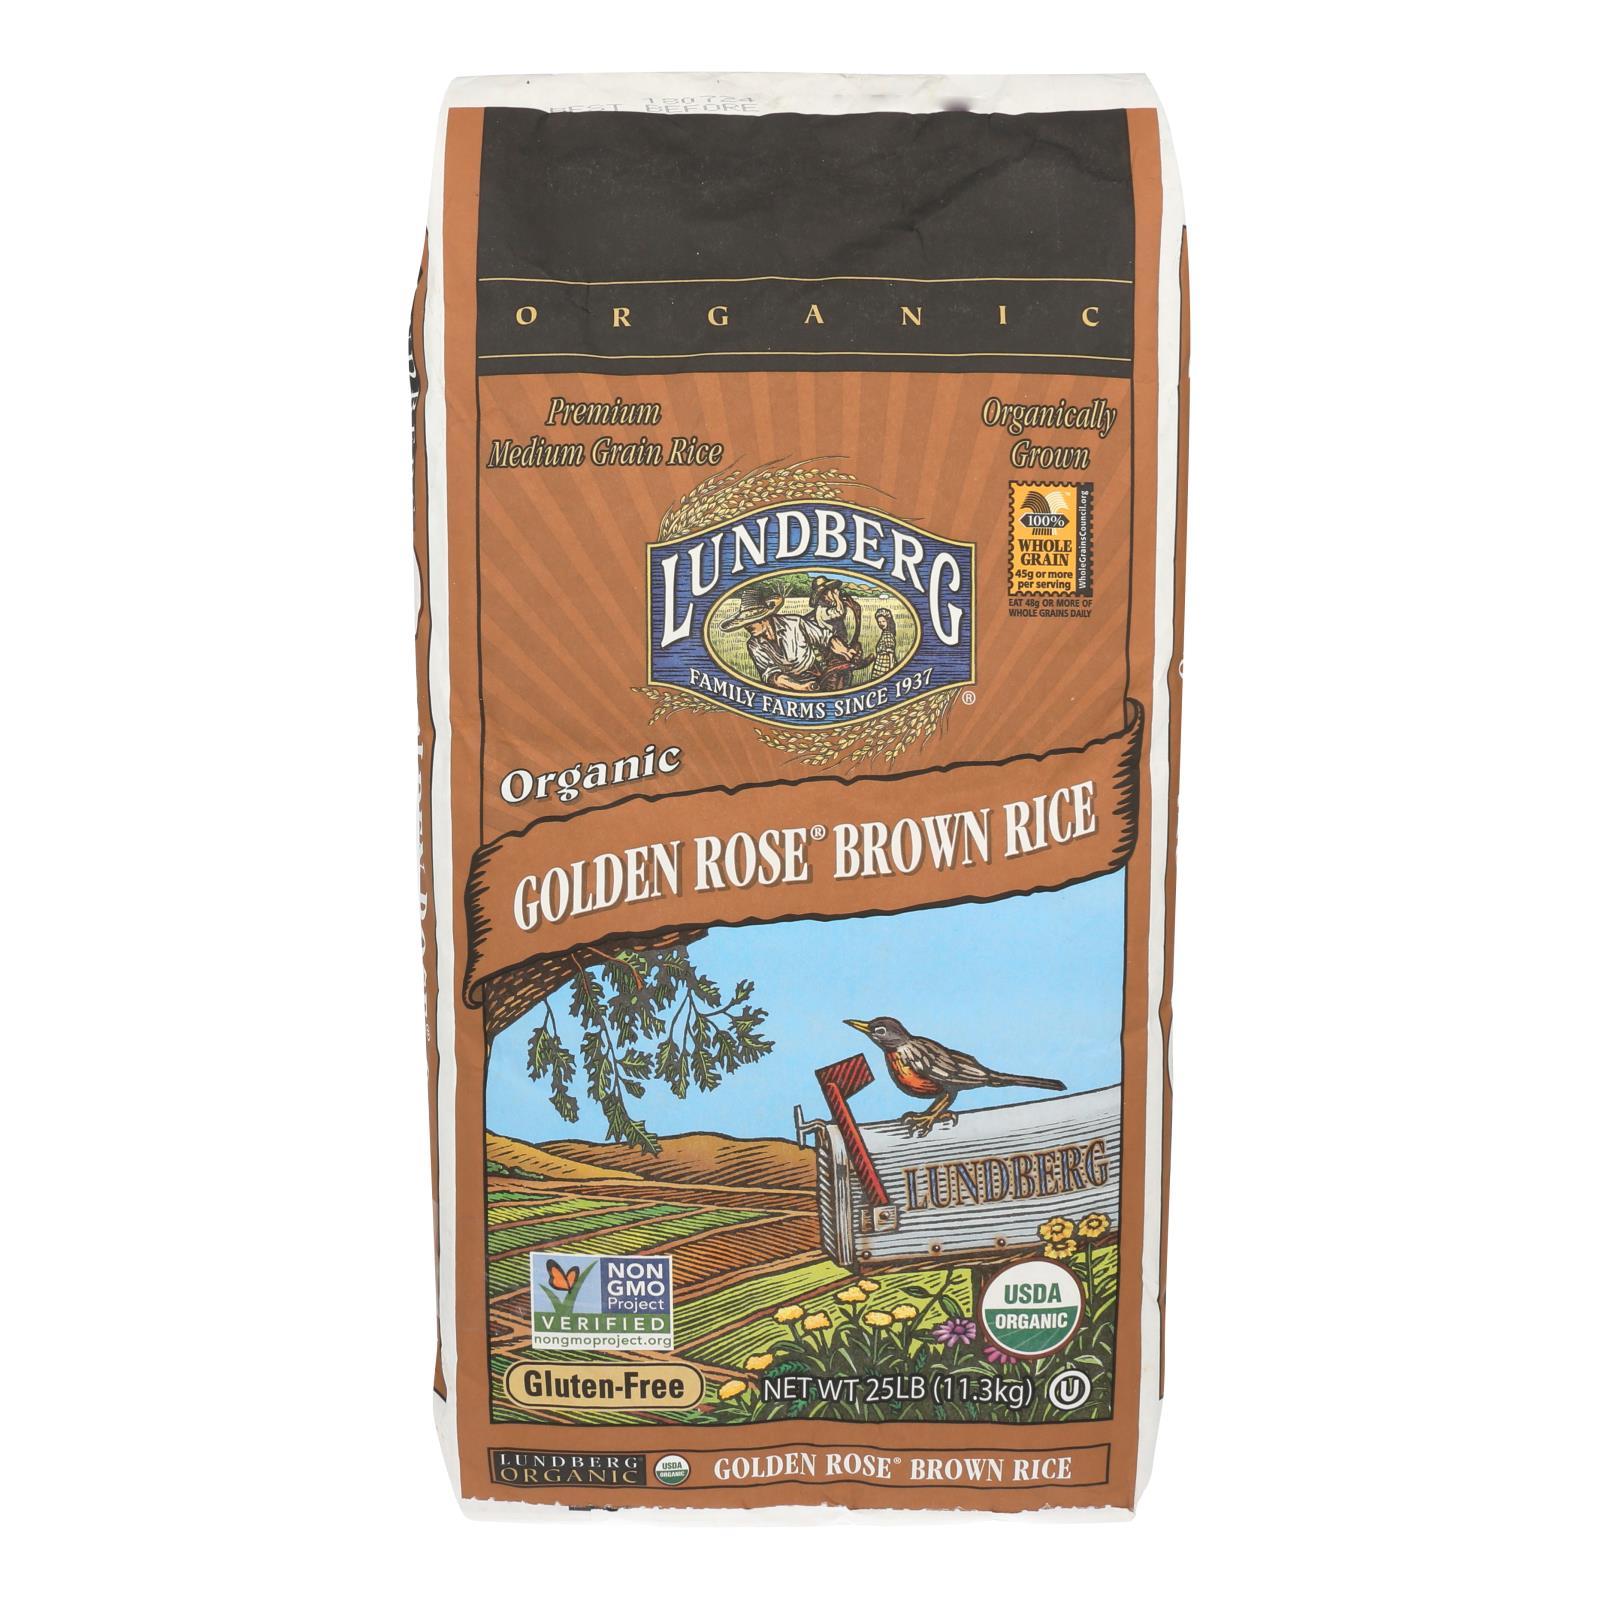 Lundberg Family Farms Organic Golden Rose Medium Grain Brown Rice - Case of 25 lbs %count(alt)